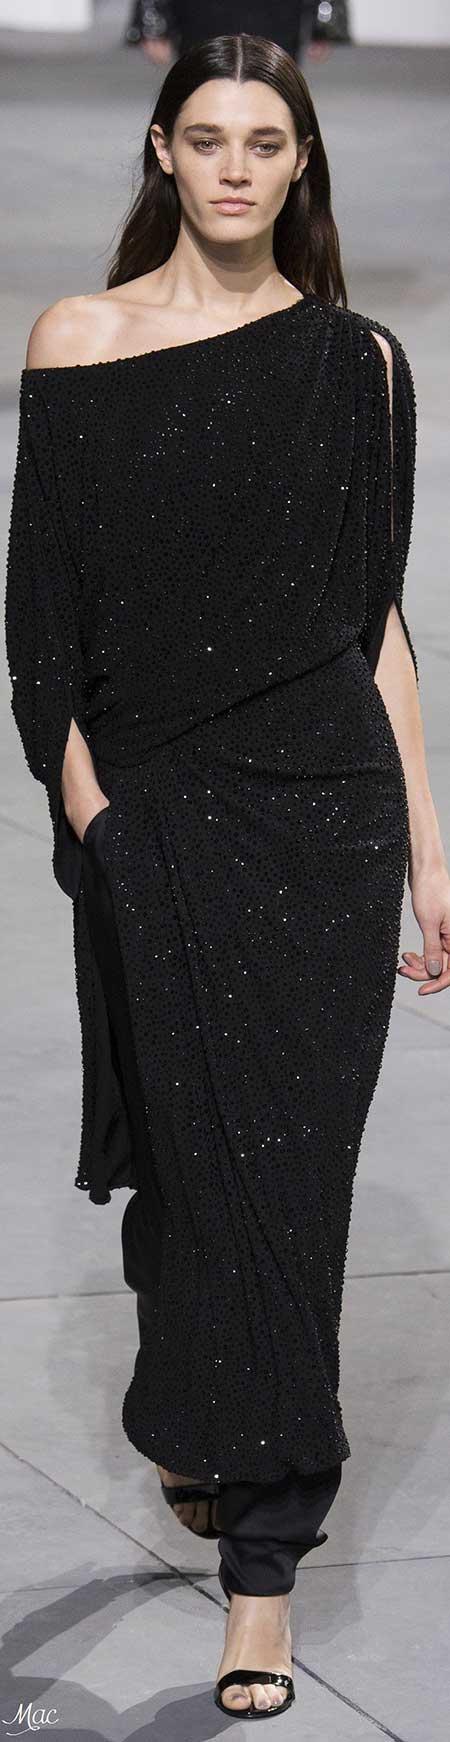 Fashion Dresses Runway NewYork - 26